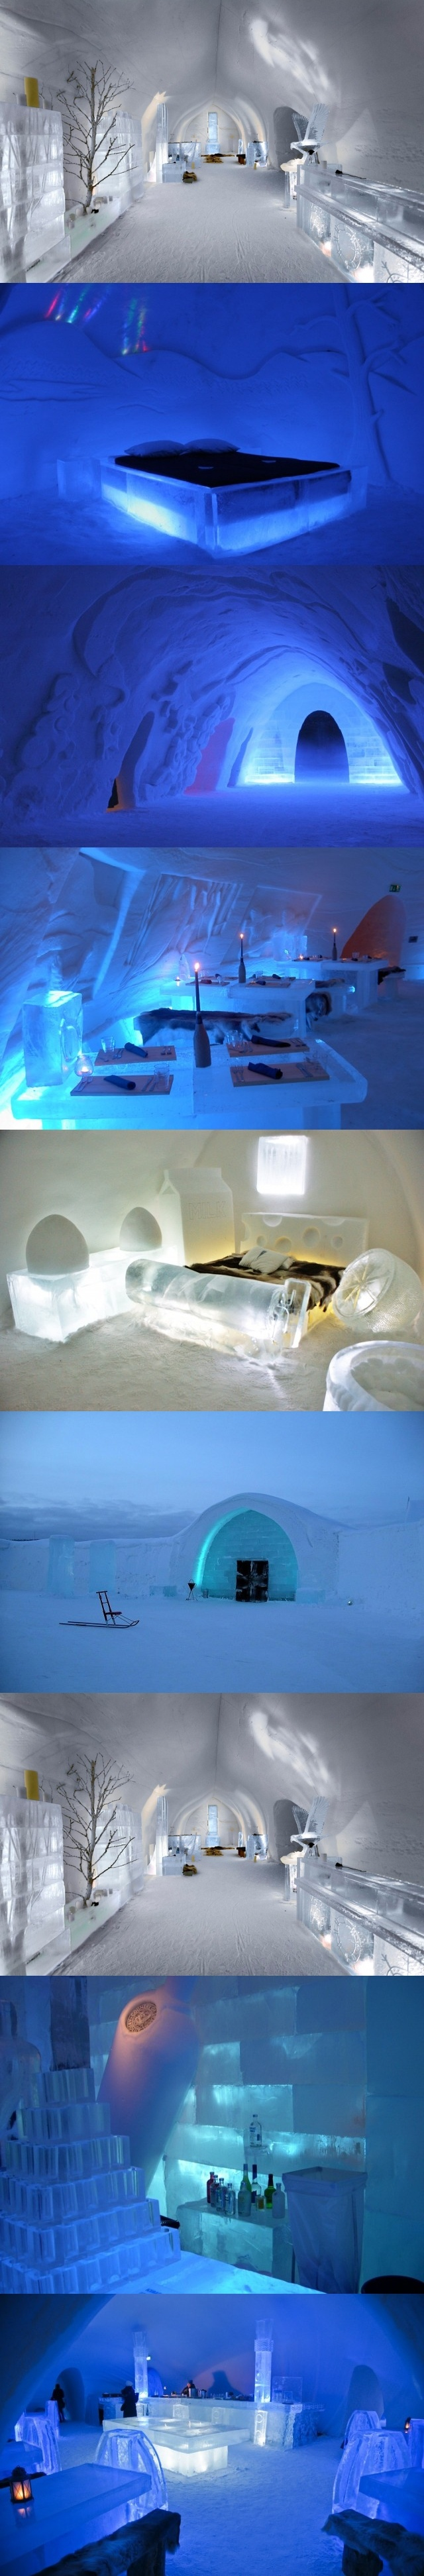 finn jéghotel